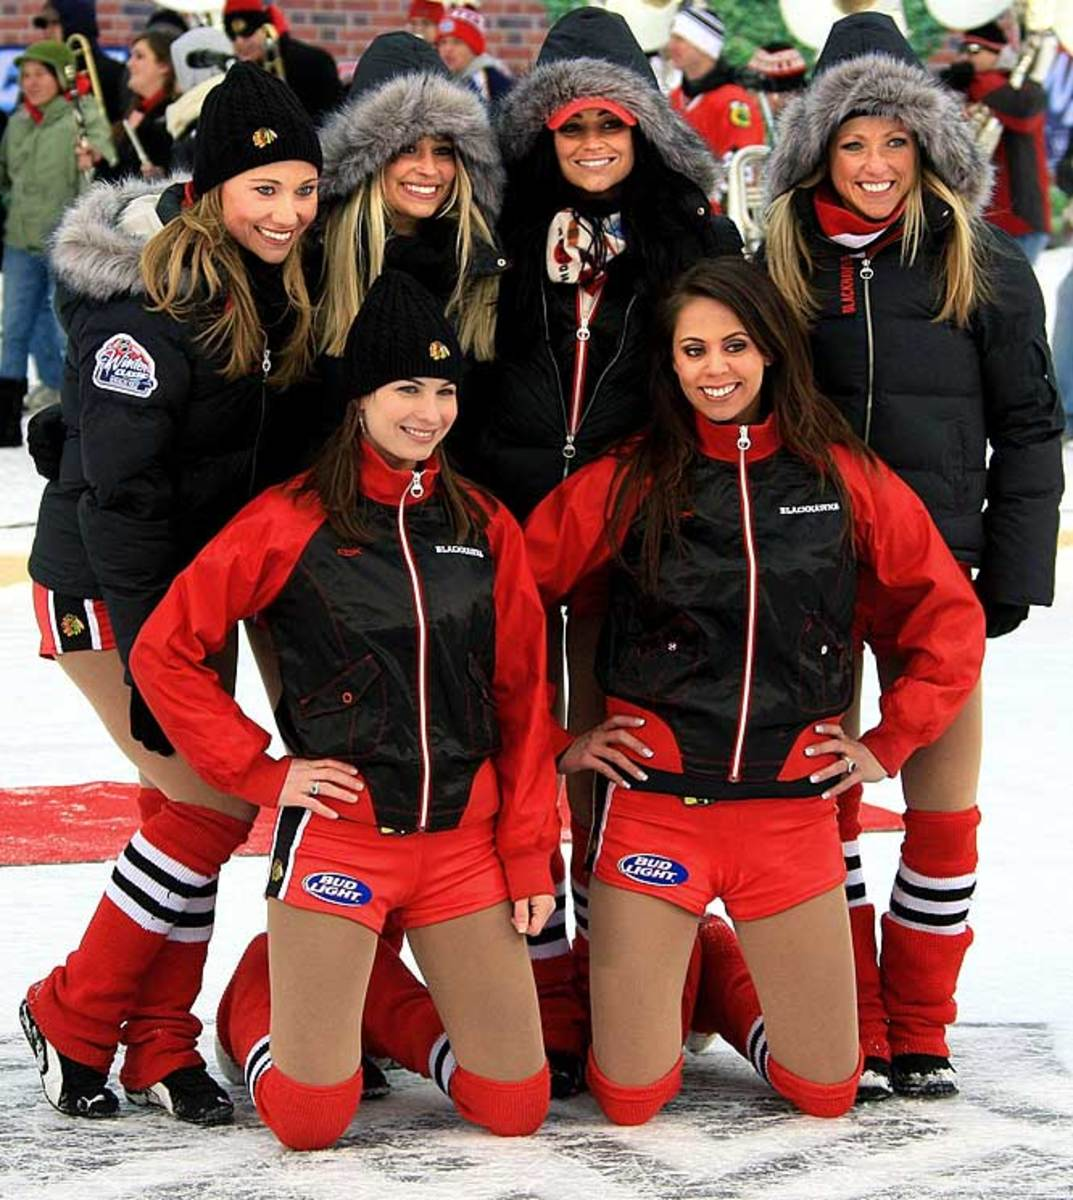 blackhawks-ice-crew%2820%29.jpg